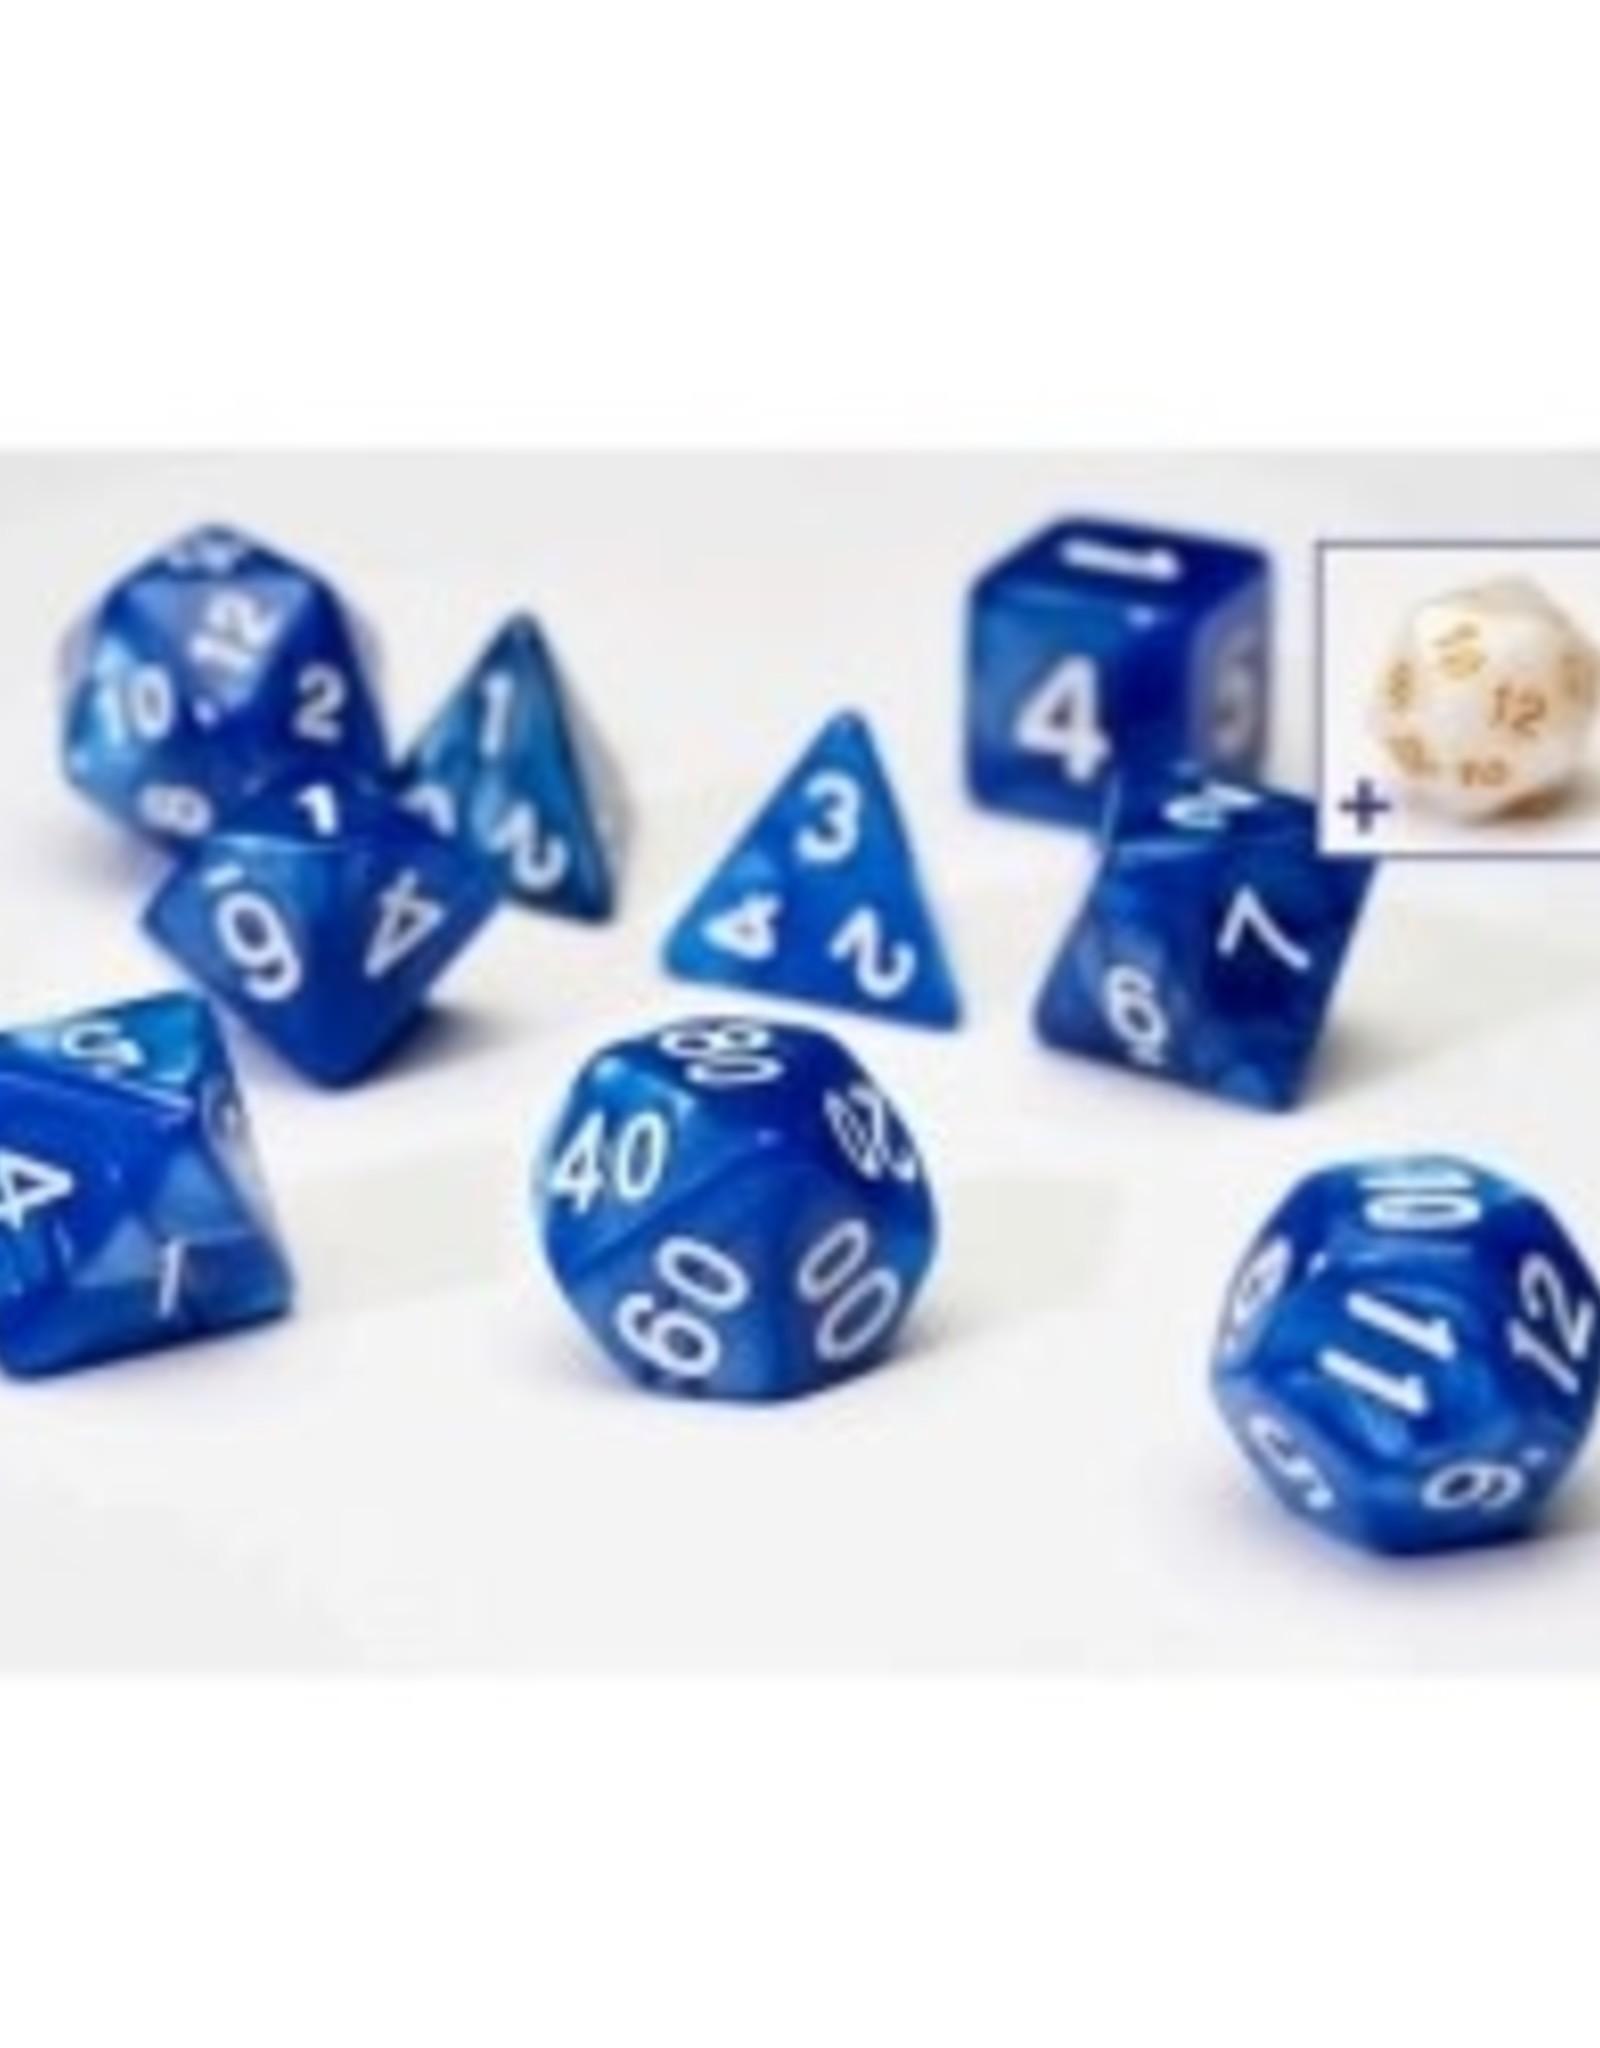 Sirius Dice Dice Block 7ct. - Pearl/Blue/White Acrylic